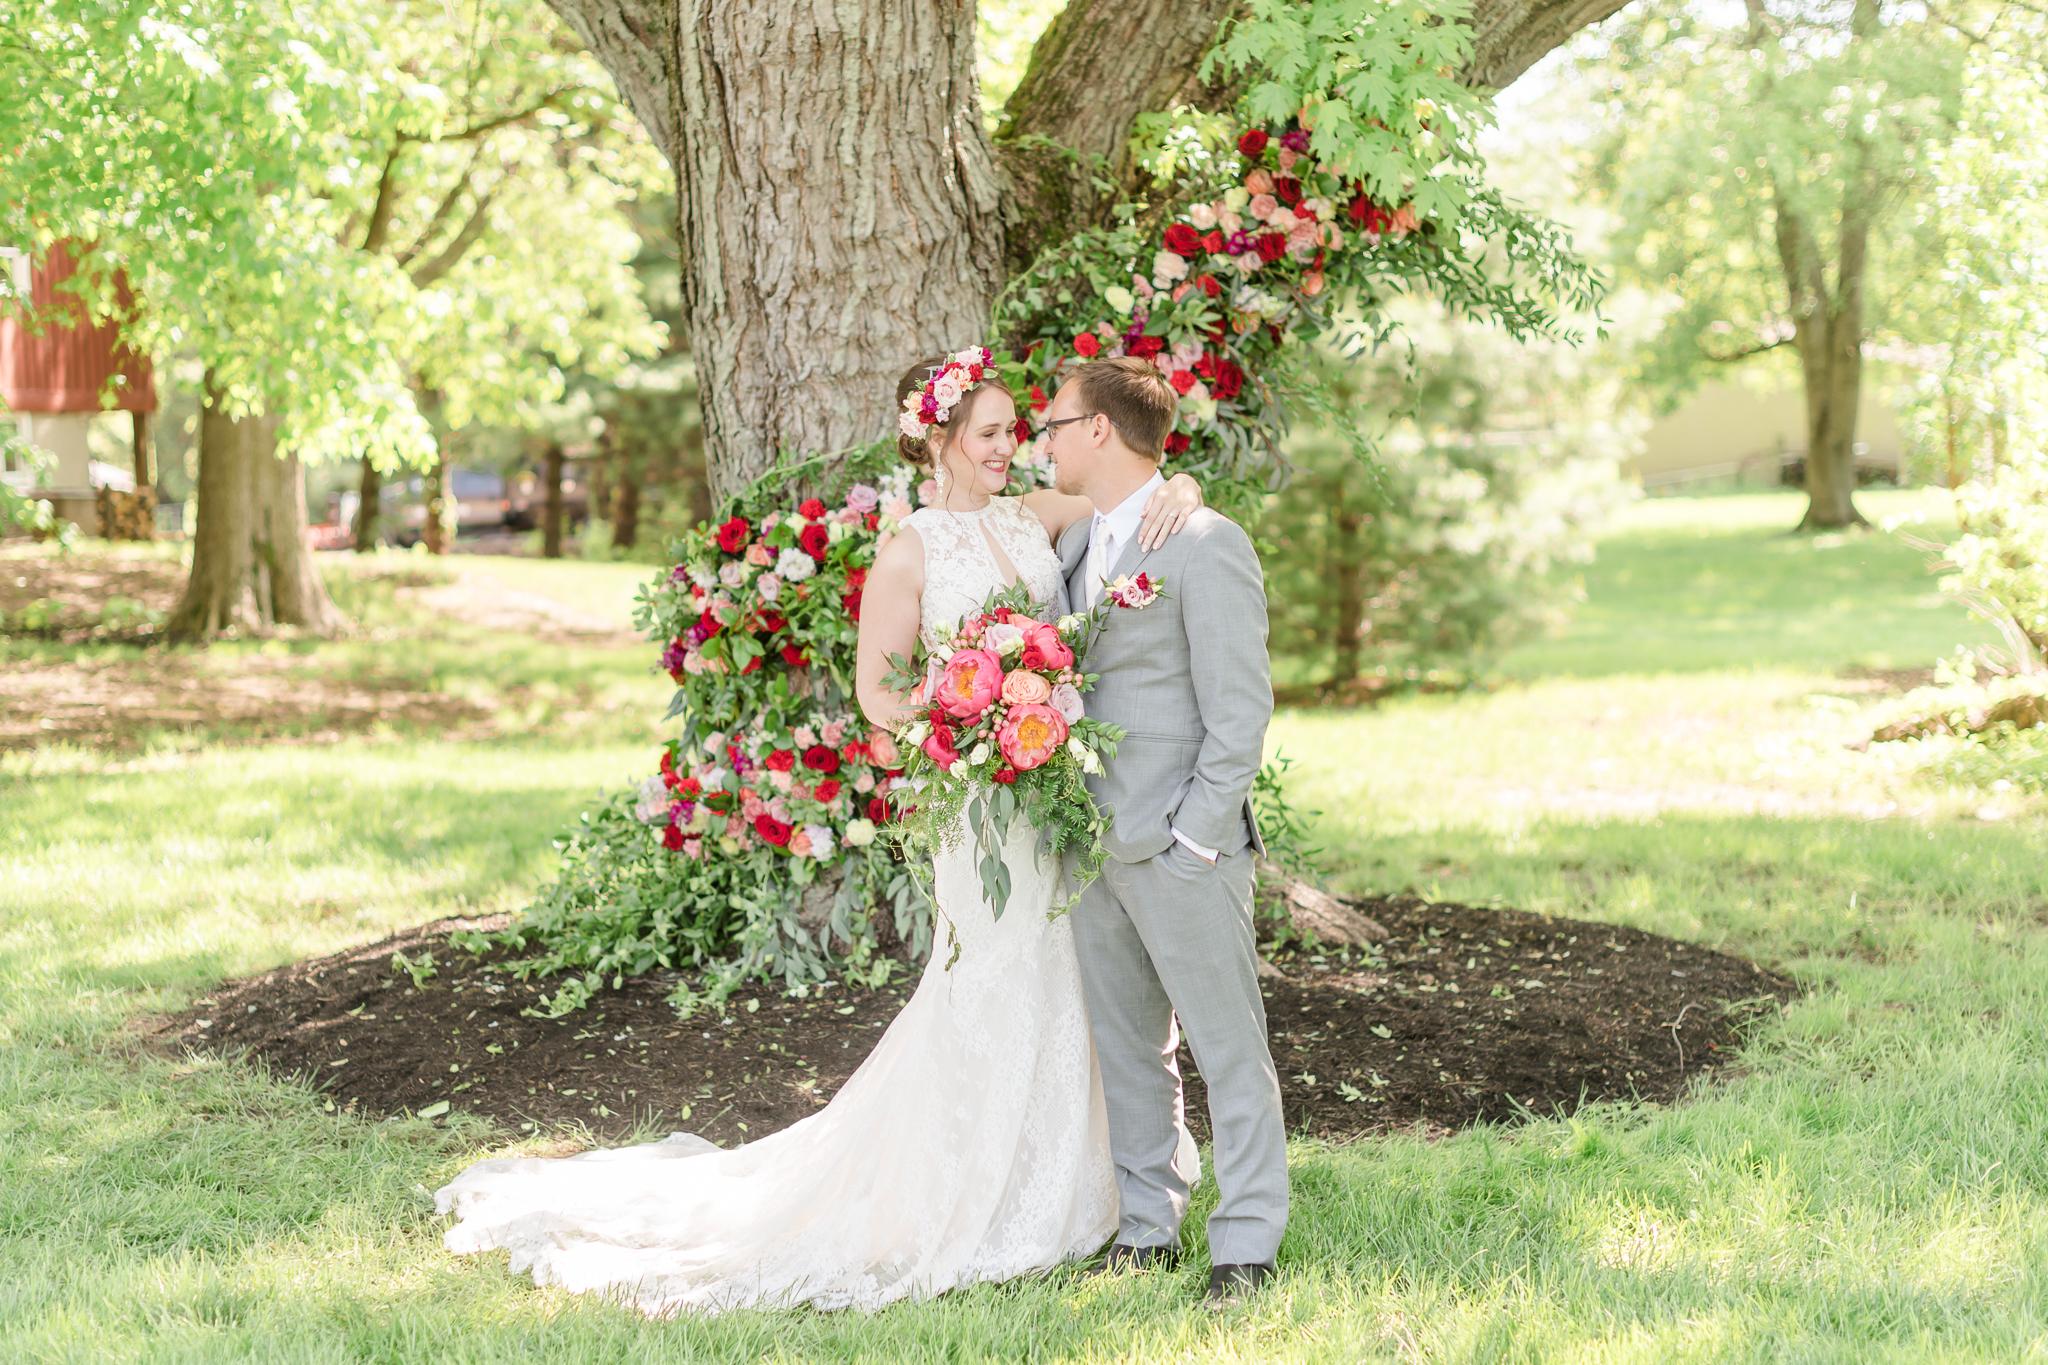 Mustard Seed Gardens Wedding Indianapolis Noblesvile Fishers Wedding Photographer-23.jpg